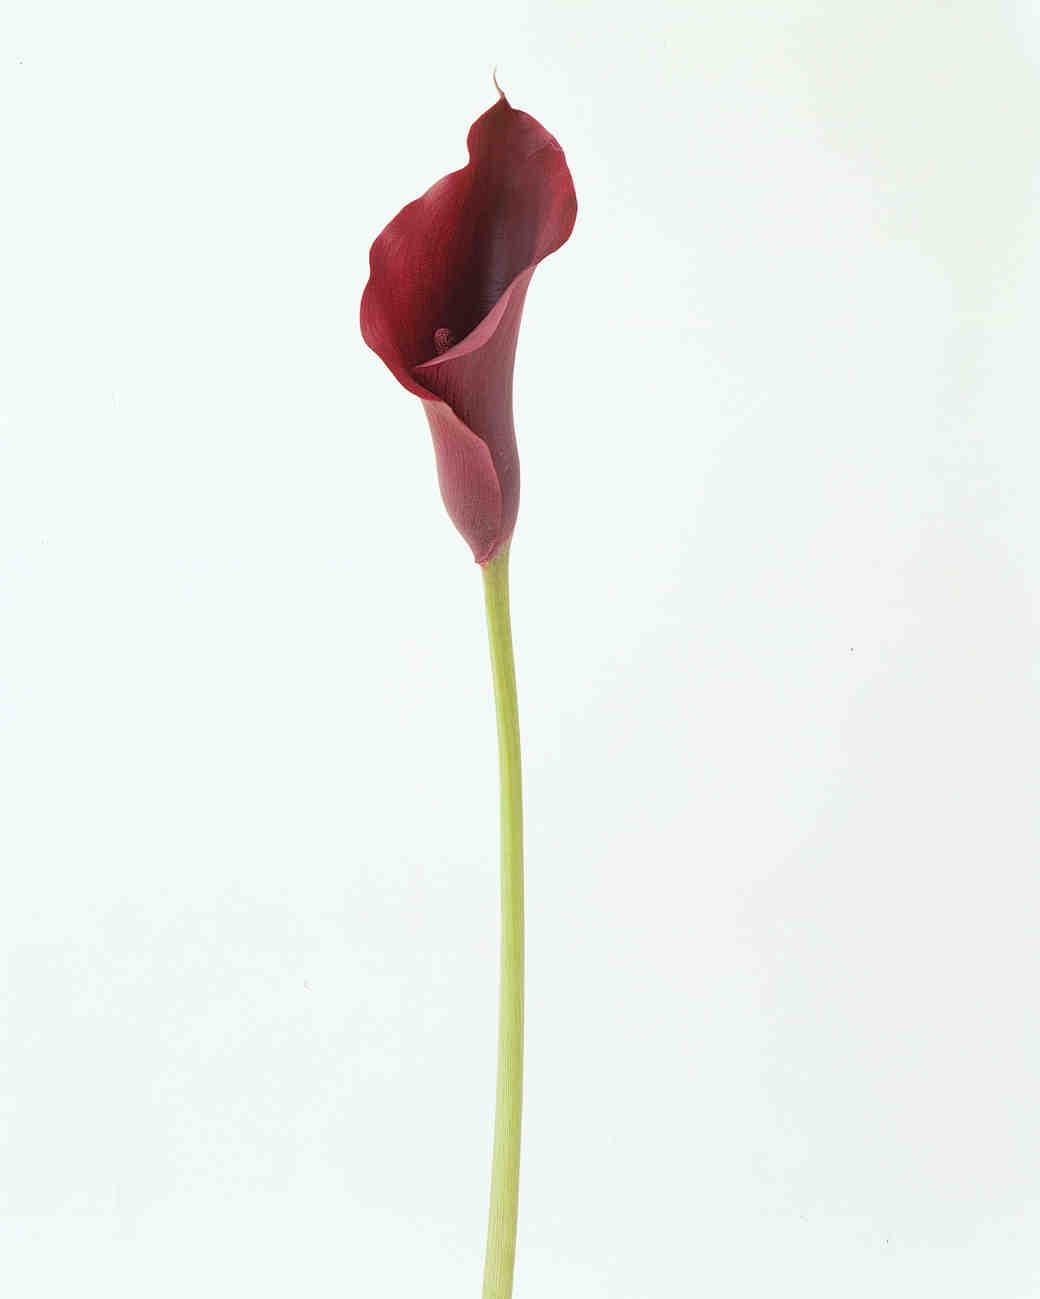 flower-glossary-calla-lily-mini-black-a98432-0415.jpg